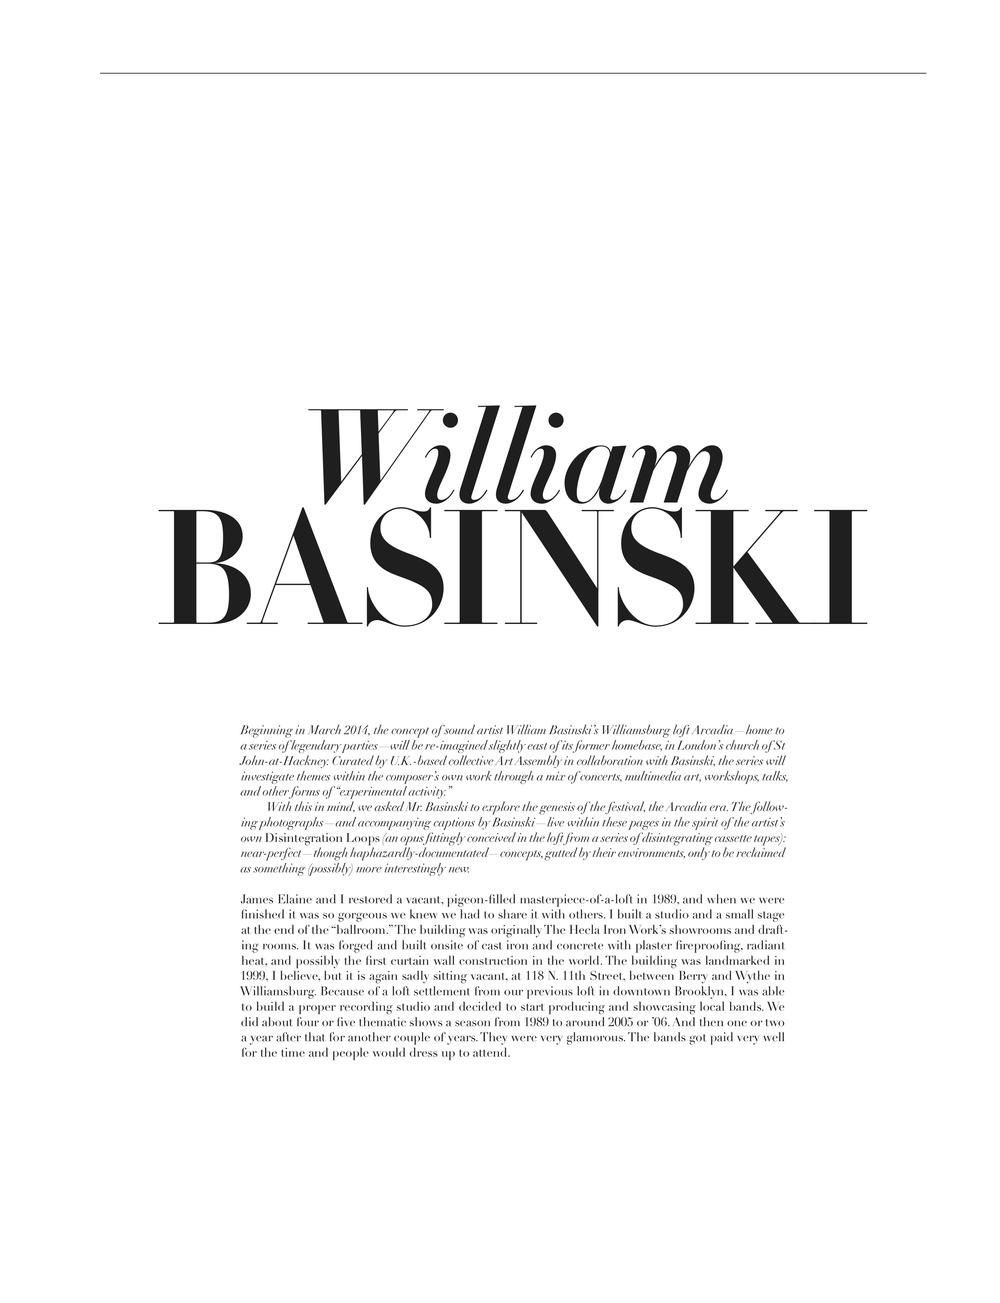 132 WILLIAM BASINSKI.jpg